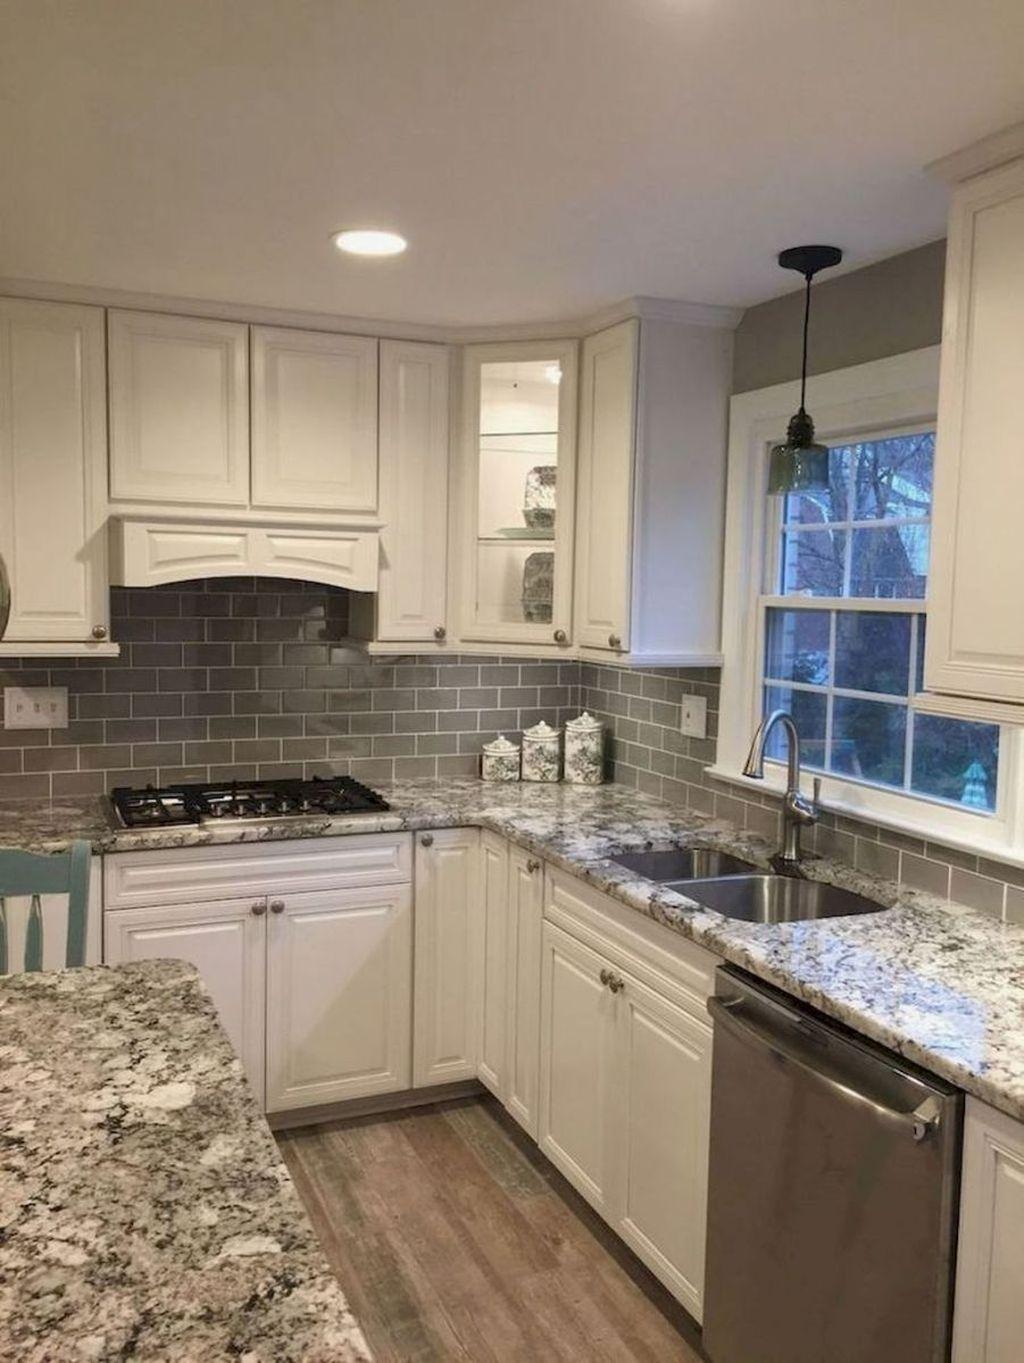 Brilliant Small Kitchen Remodel Design Ideas On A Budget 37